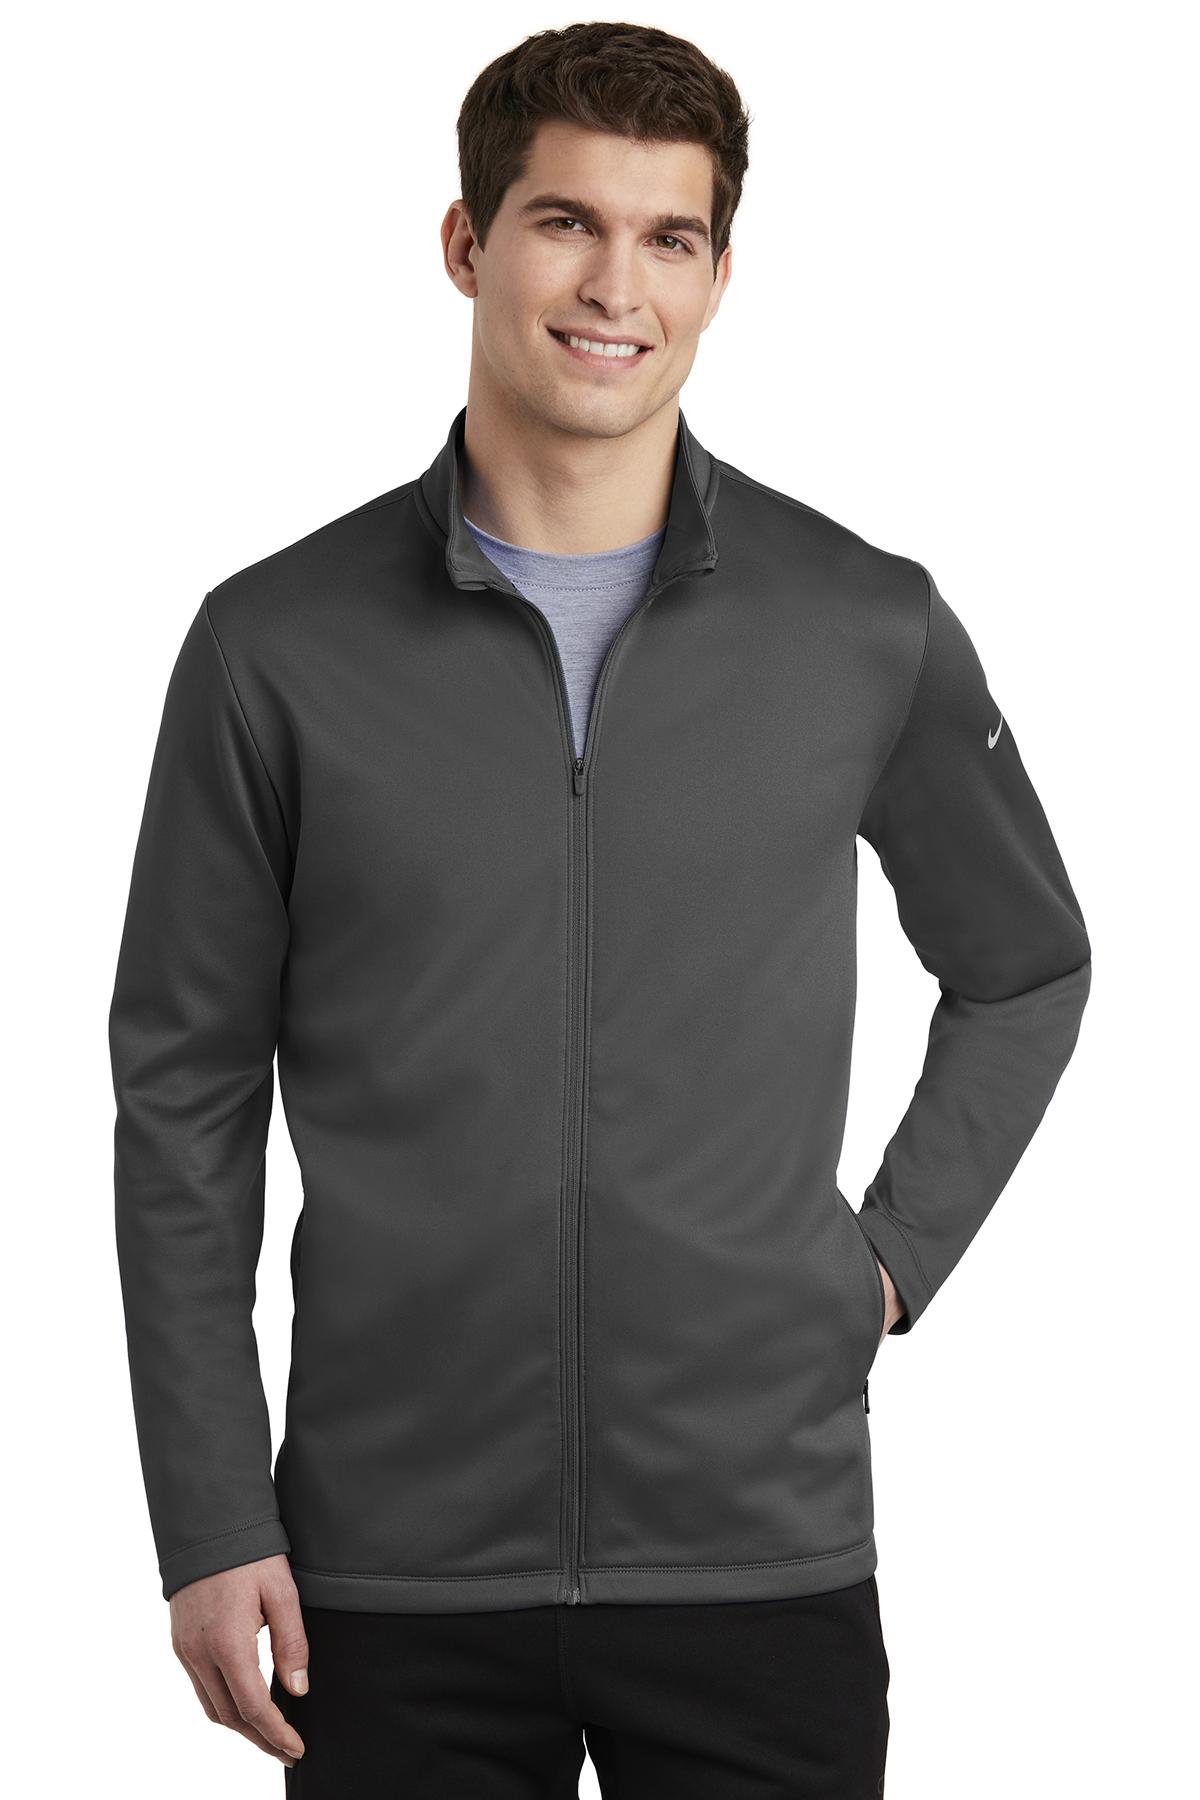 Nike Golf NKAH6418 - Men's Therma-FIT Full Zip Fleece